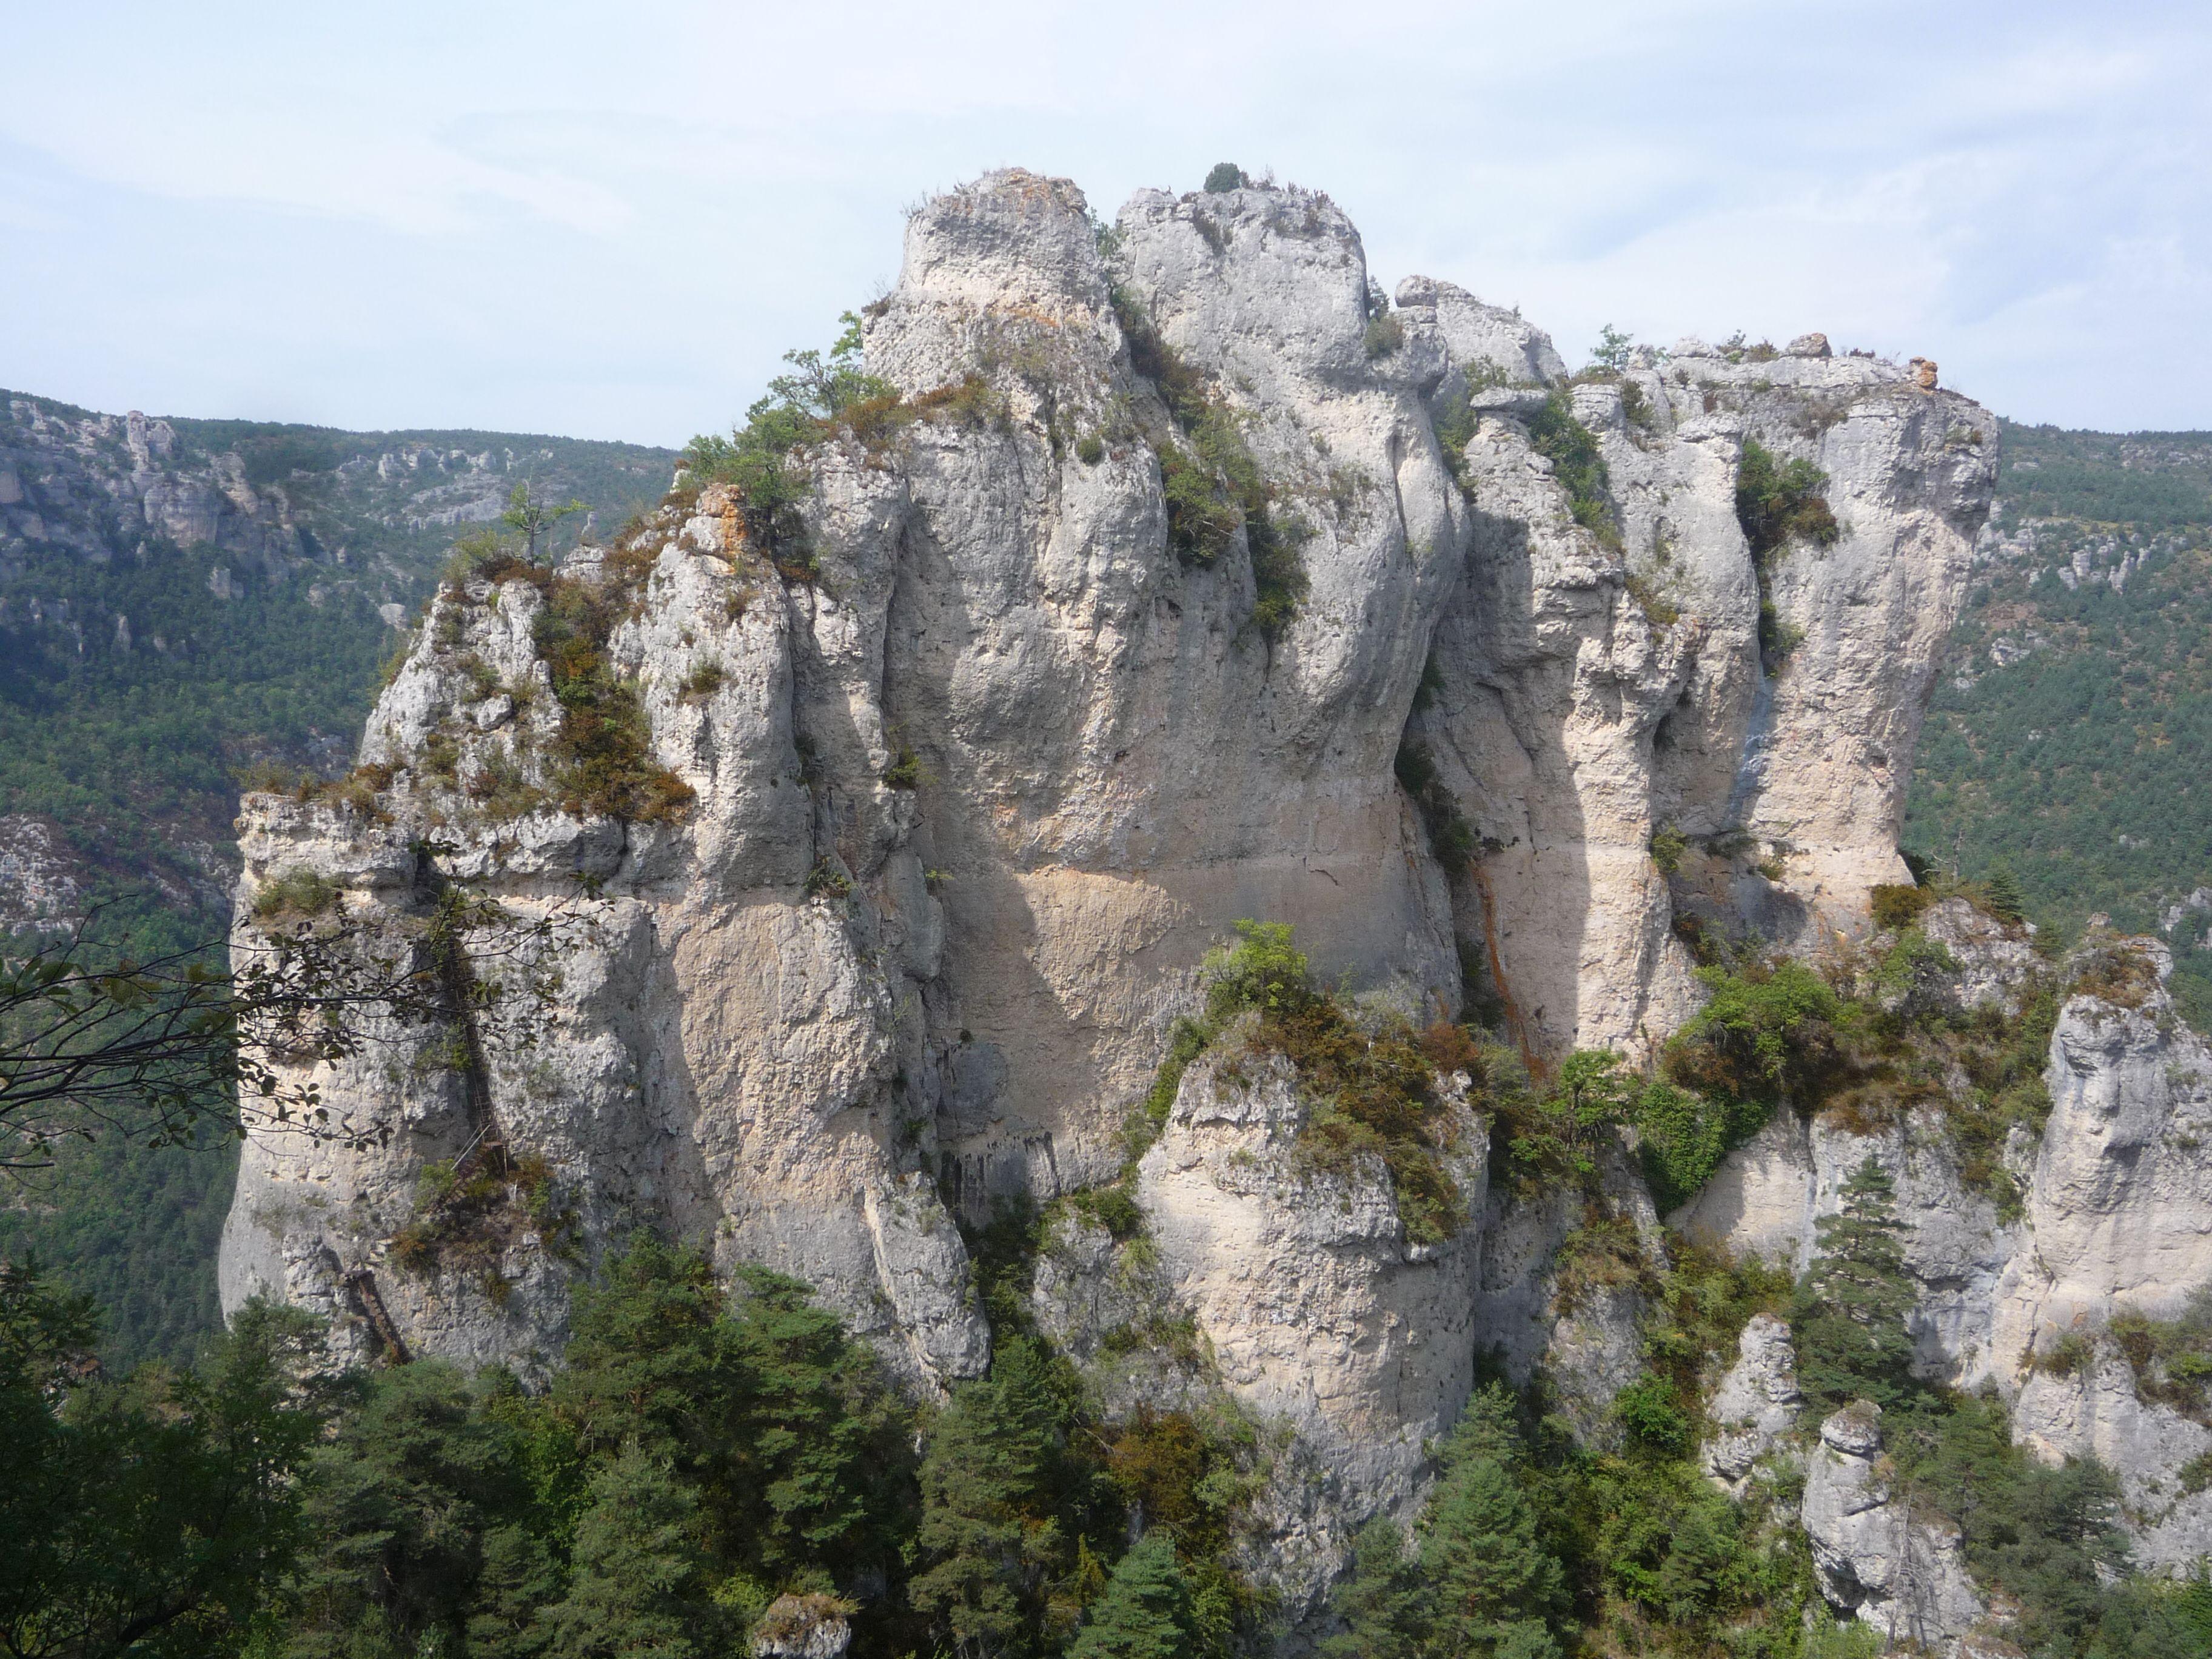 Le rocher du Cinglegros